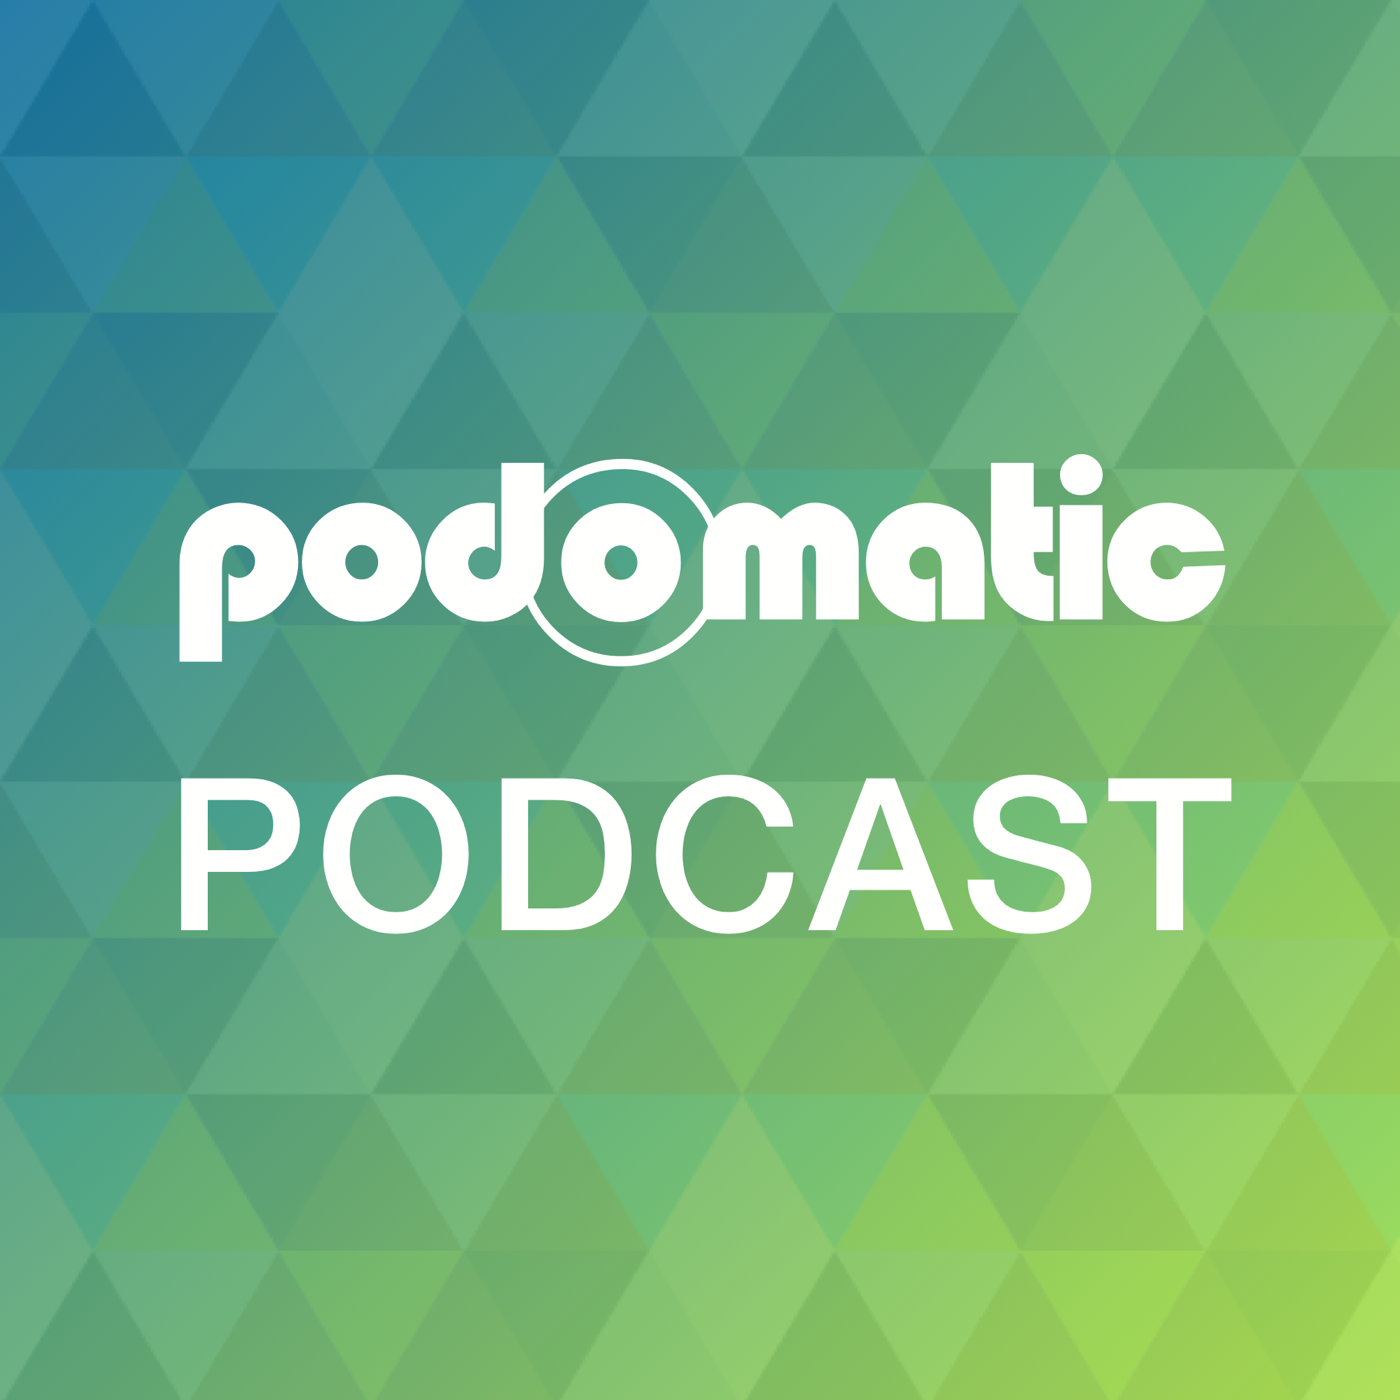 Sony Spoon's Podcast